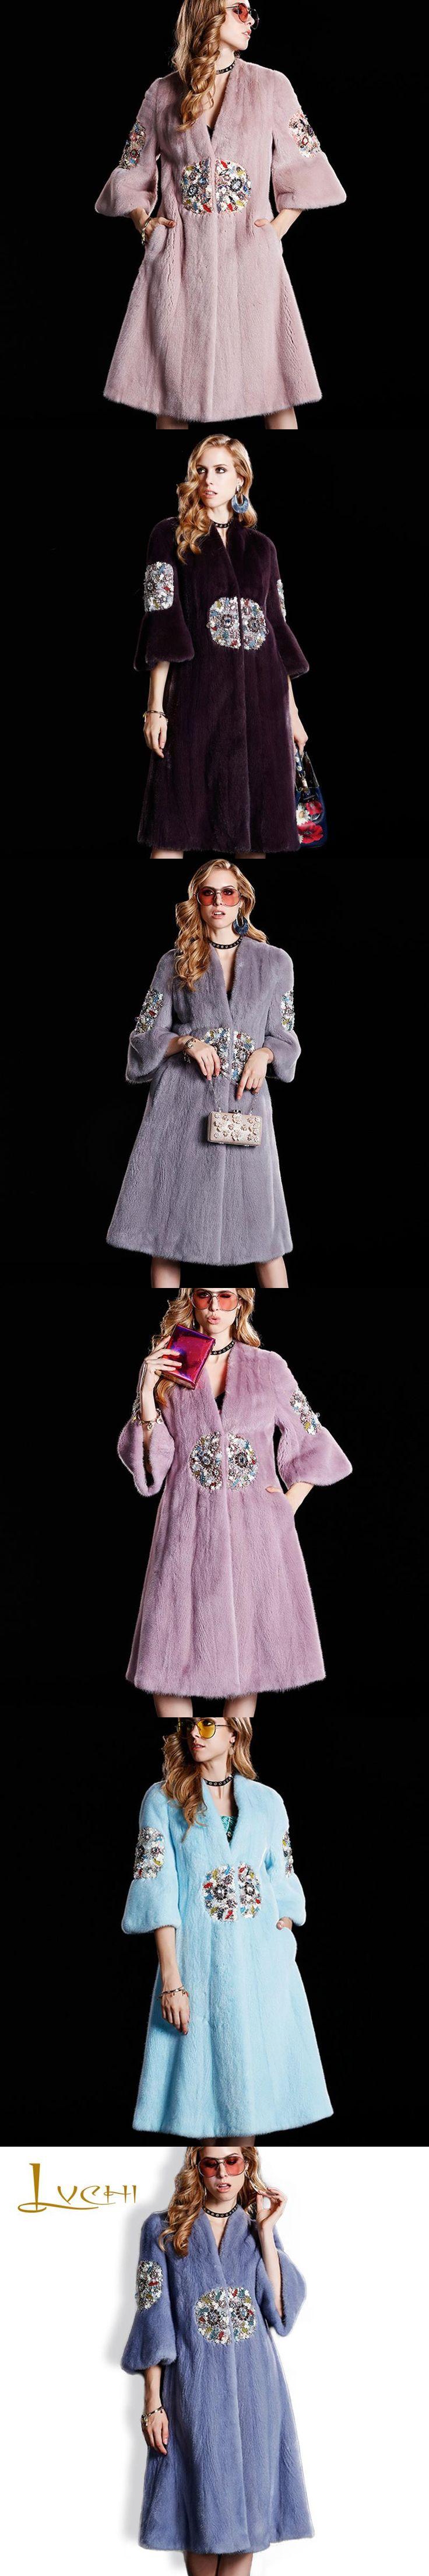 LVCHI Imported Platinum Velvet Mink Fur tunic Coats Round Print Diamond Fashion Fur Topcoat Winter Women's Clothing Real Fur